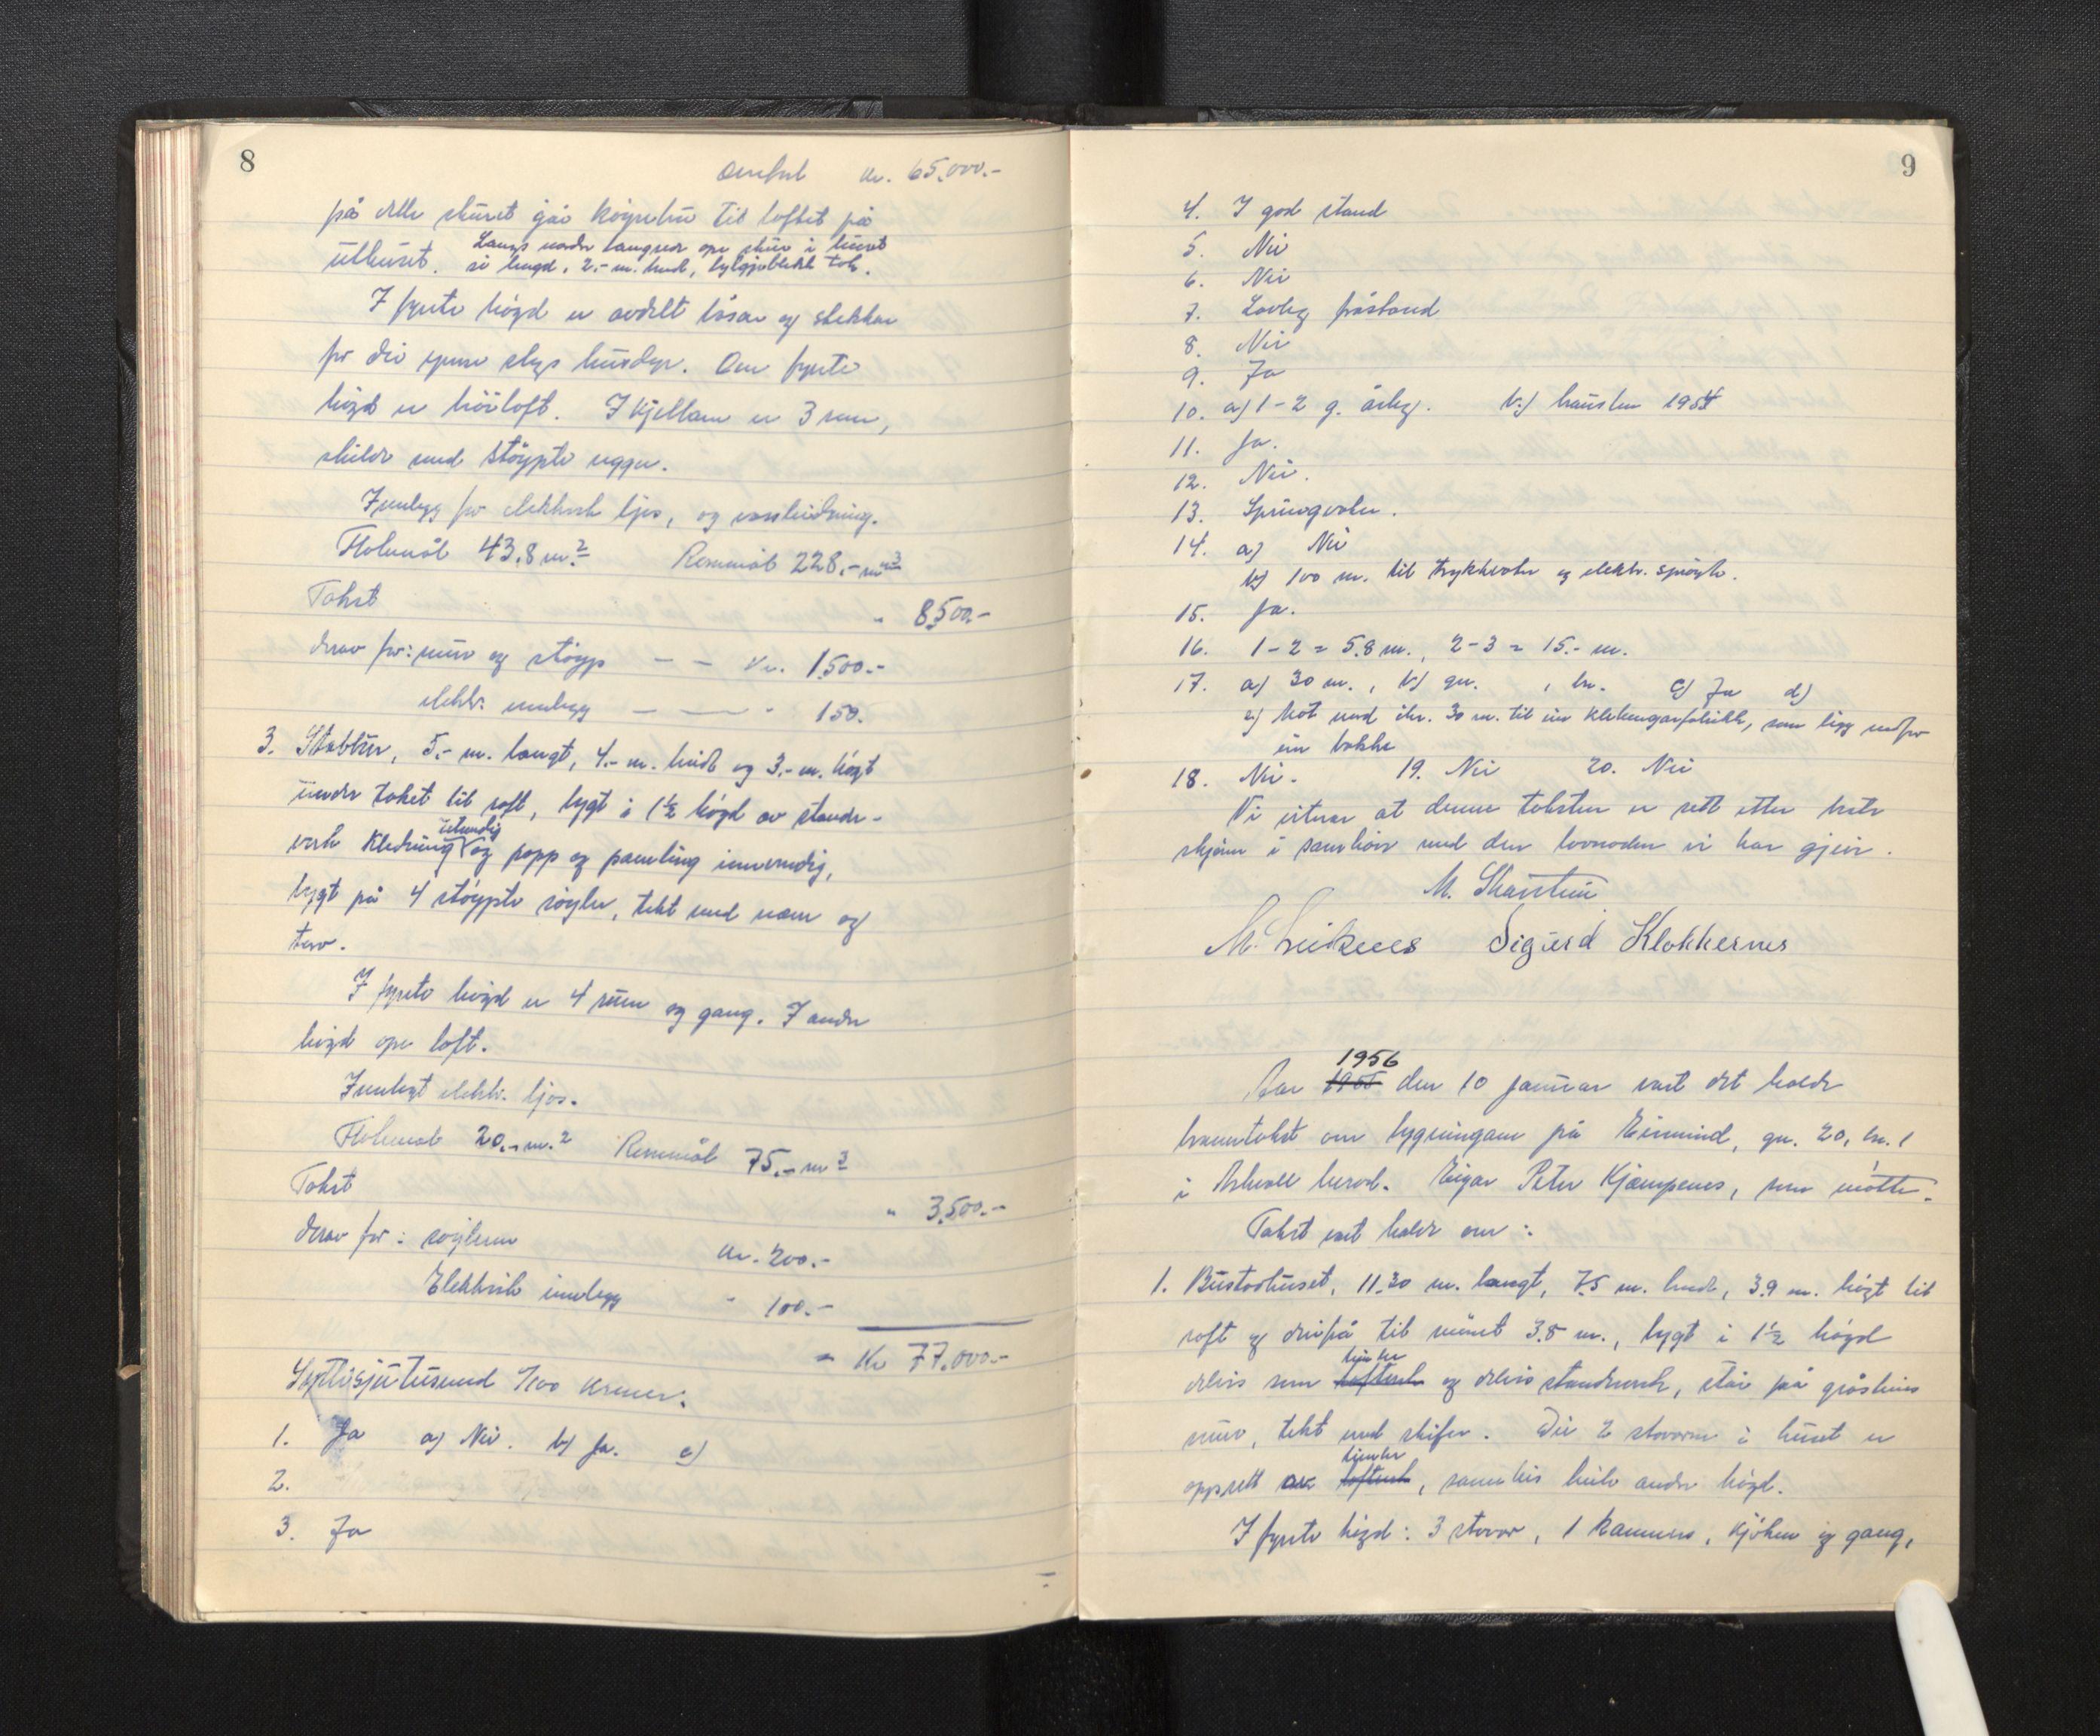 SAB, Lensmannen i Askvoll, 0012/L0003: Branntakstprotokoll, 1952-1956, s. 8-9